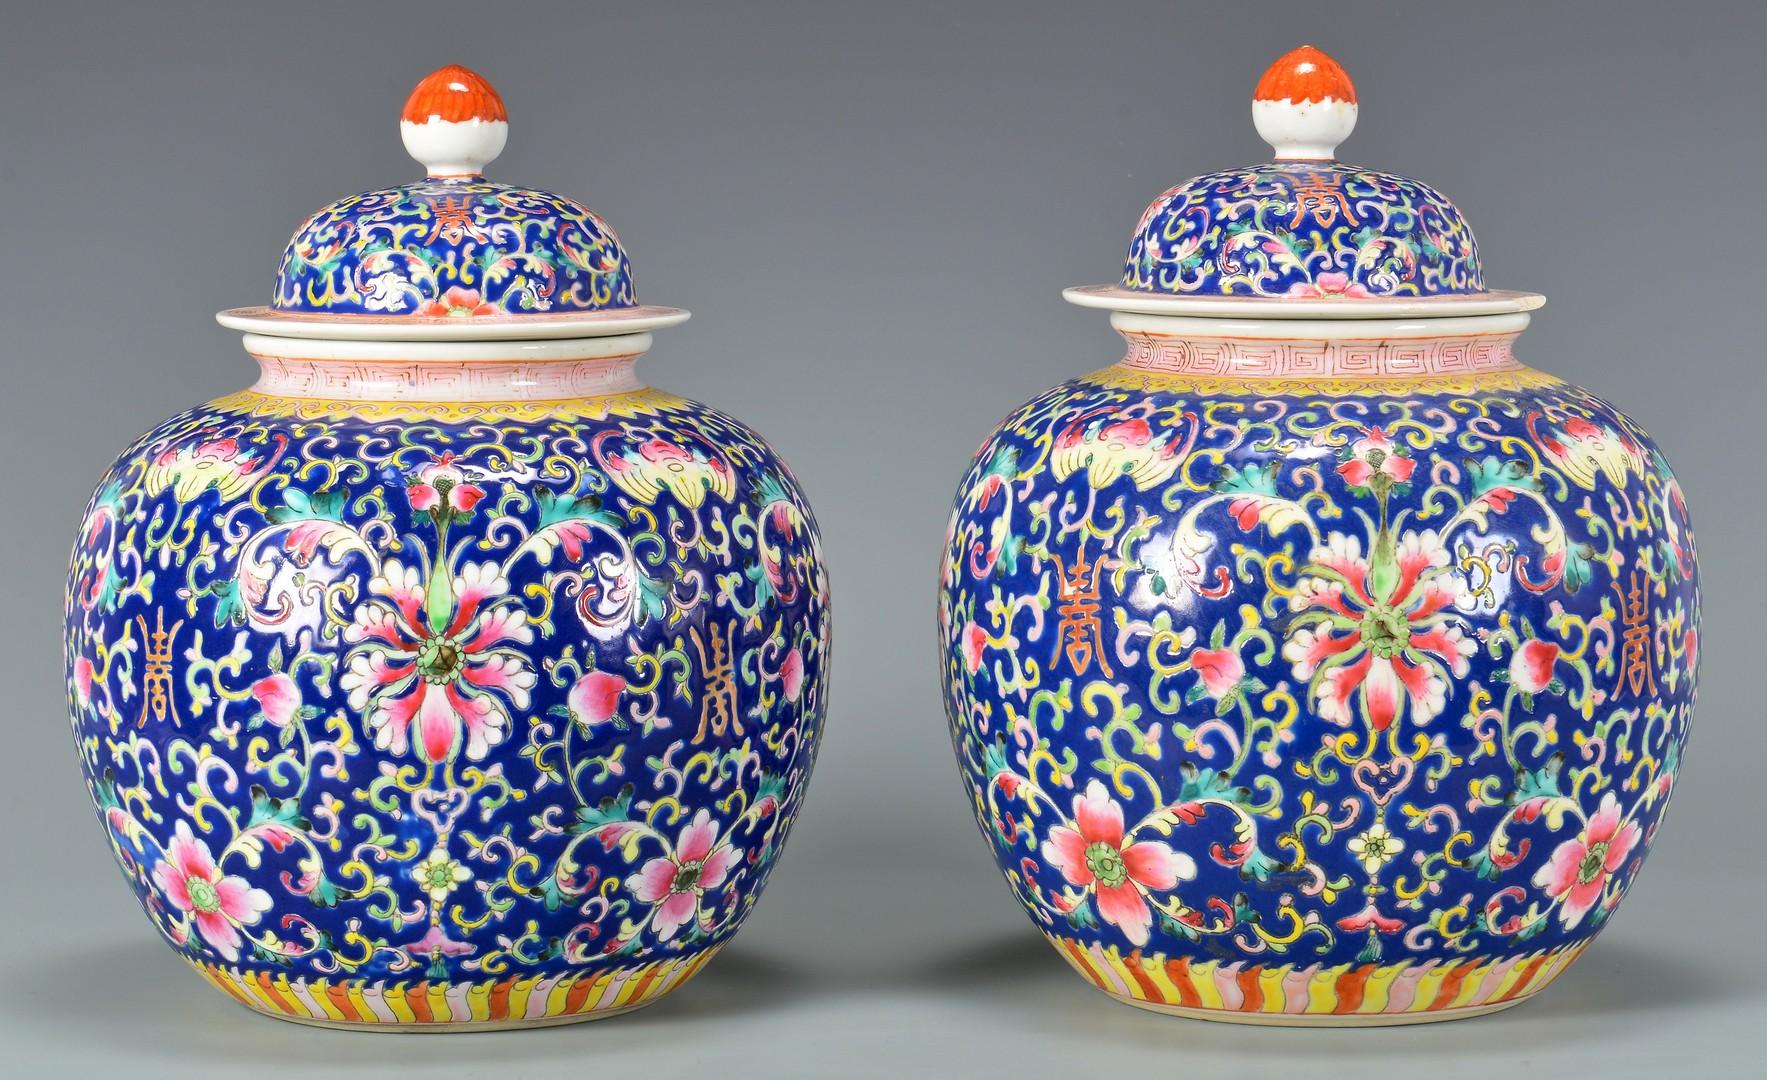 Lot 4010069: Pr. Blue Enamel Ground Famille Rose Ginger Jars